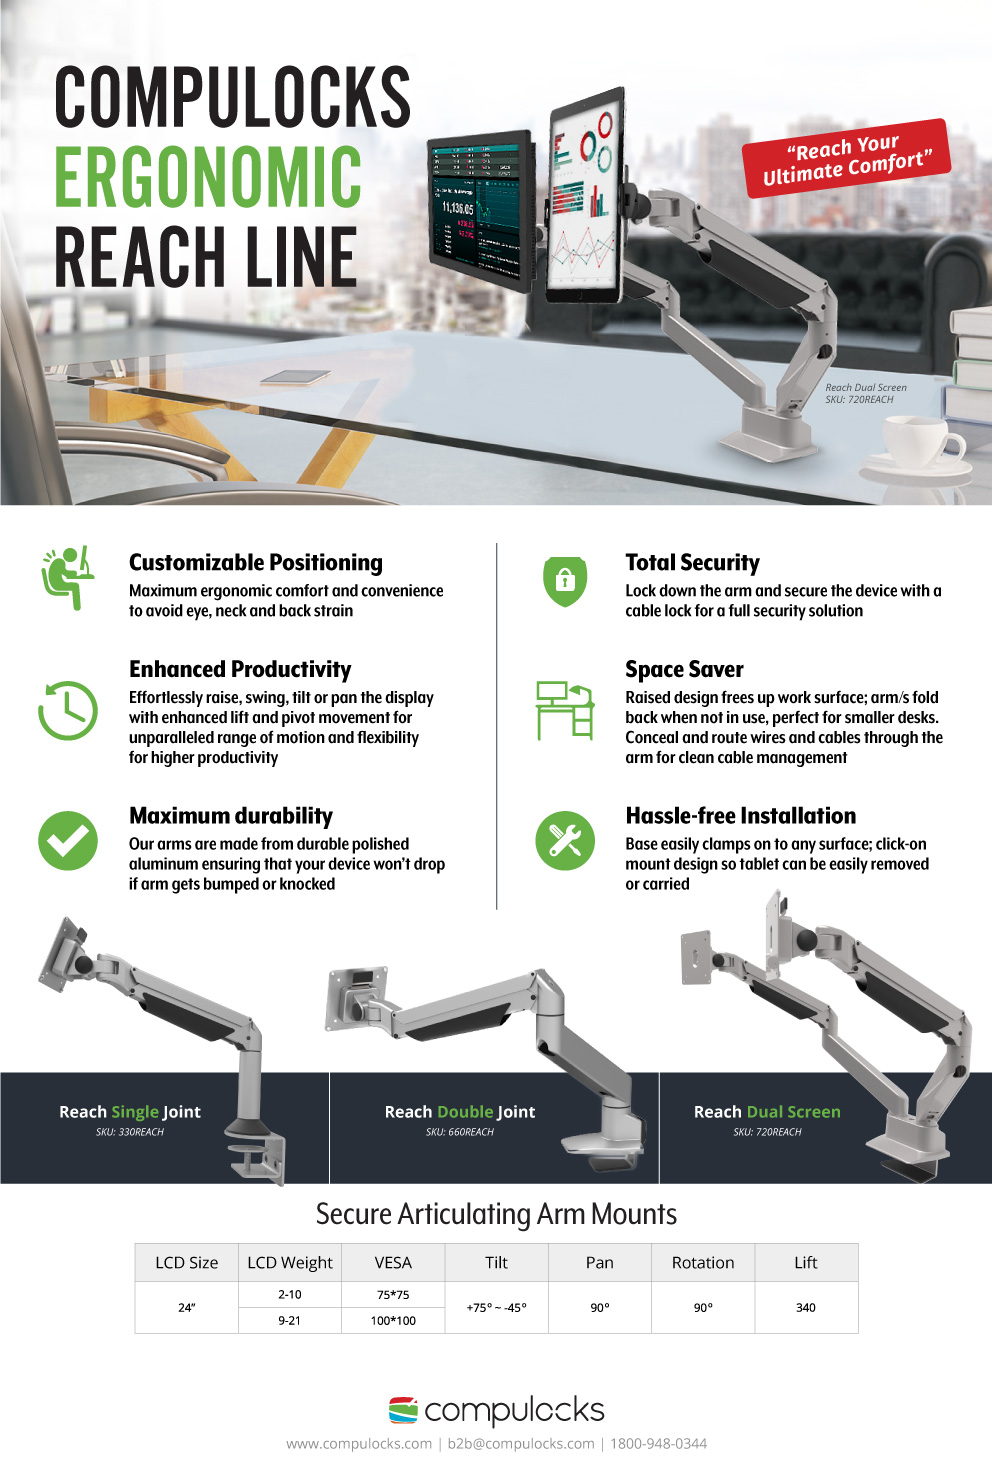 Reach Dual Screen Articulating Double Arm VESA Mount